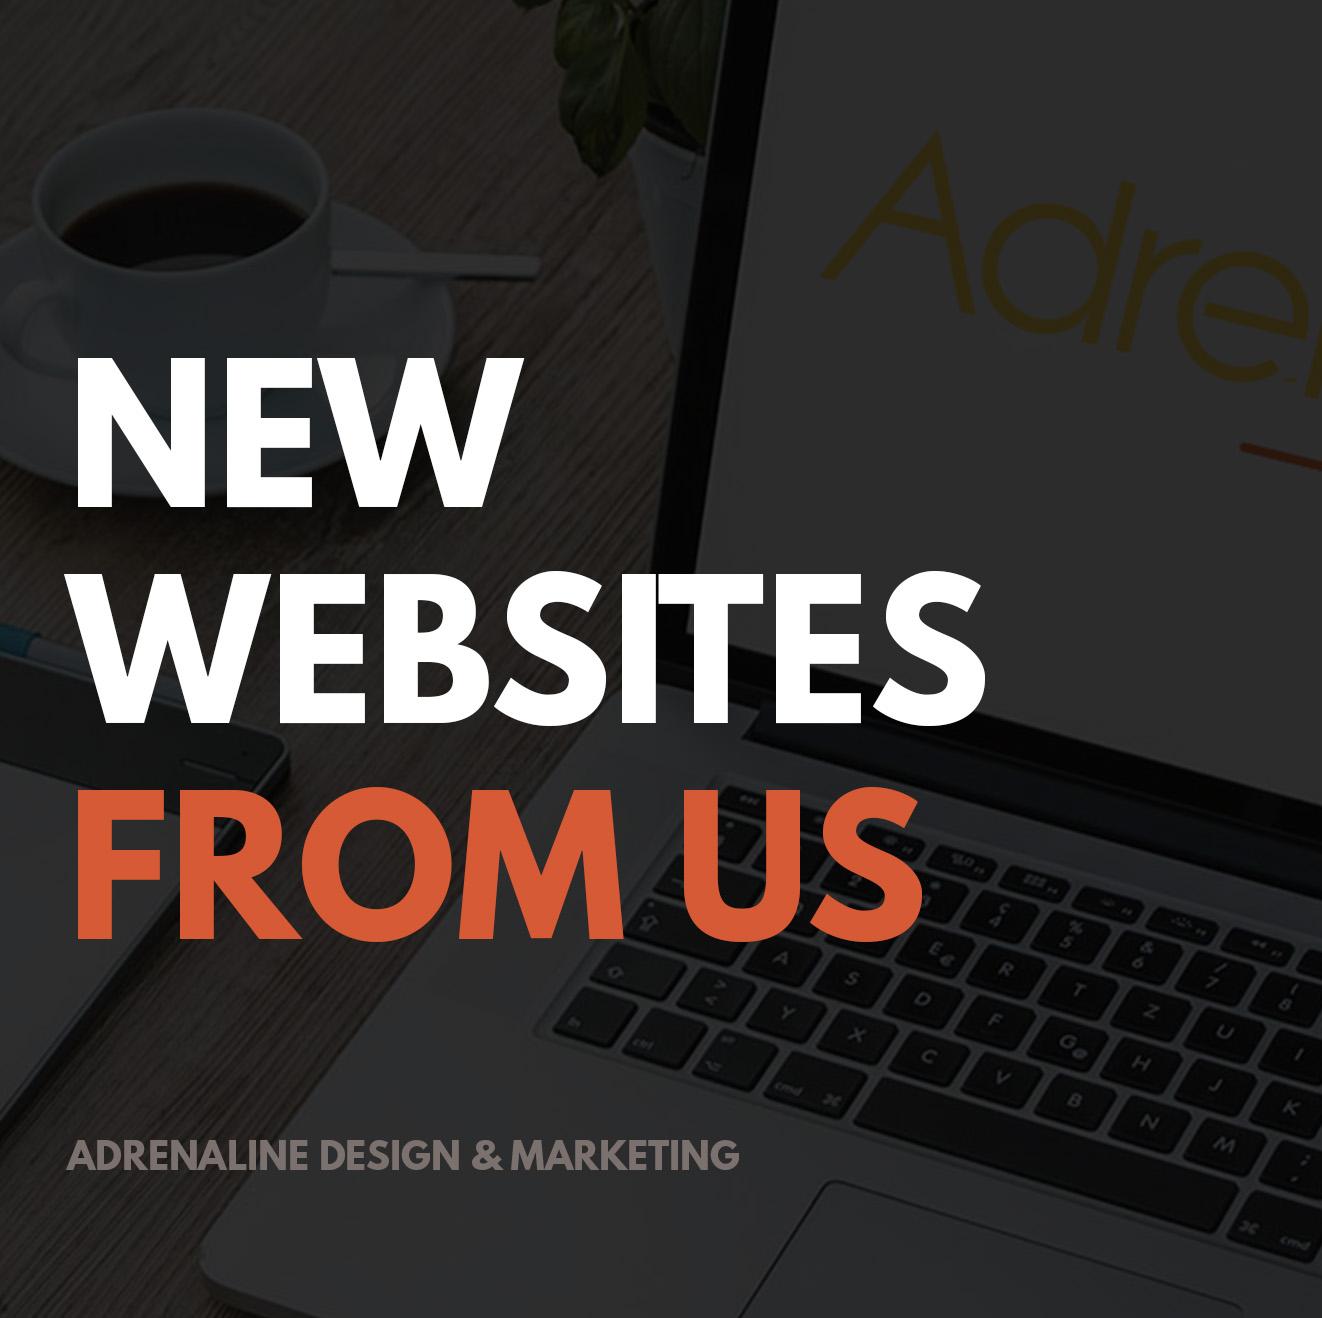 New Websites from Adrenaline